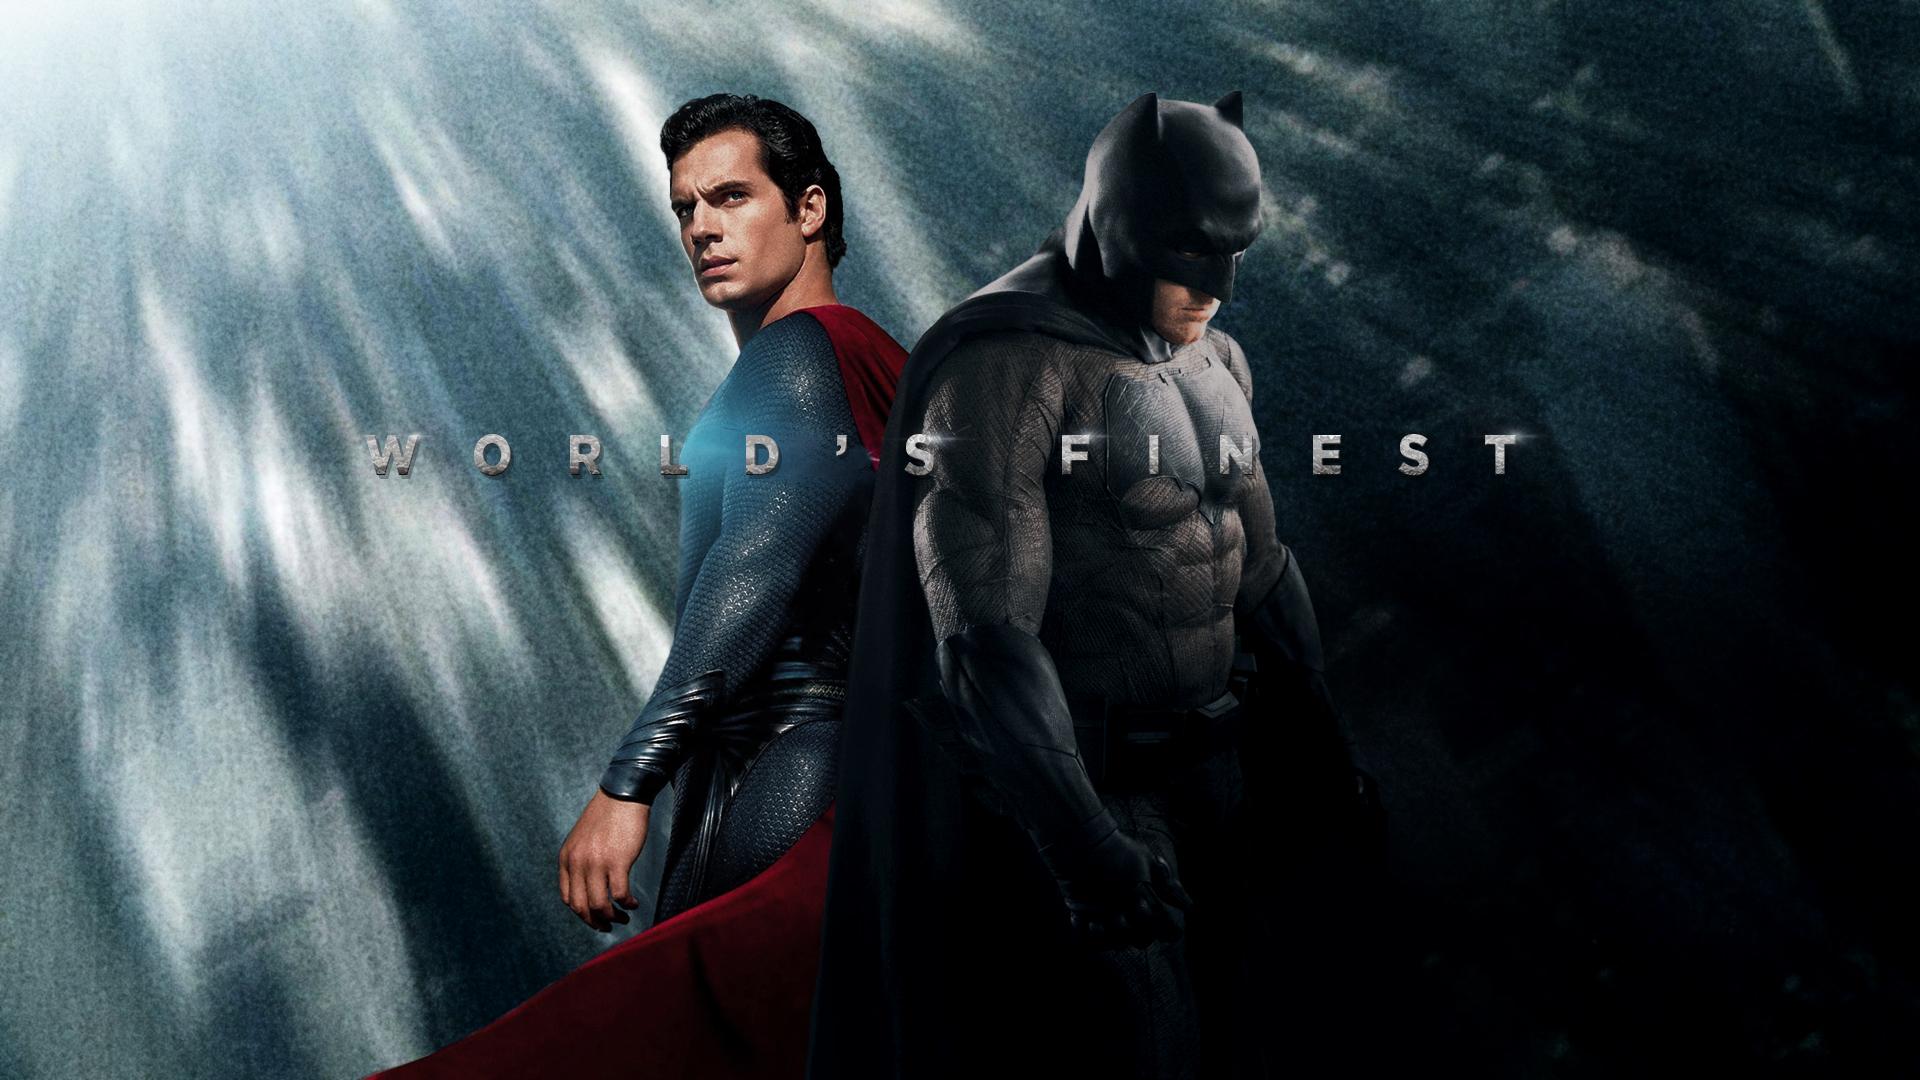 batman vs superman hd wallpaper for desktop | adsleaf